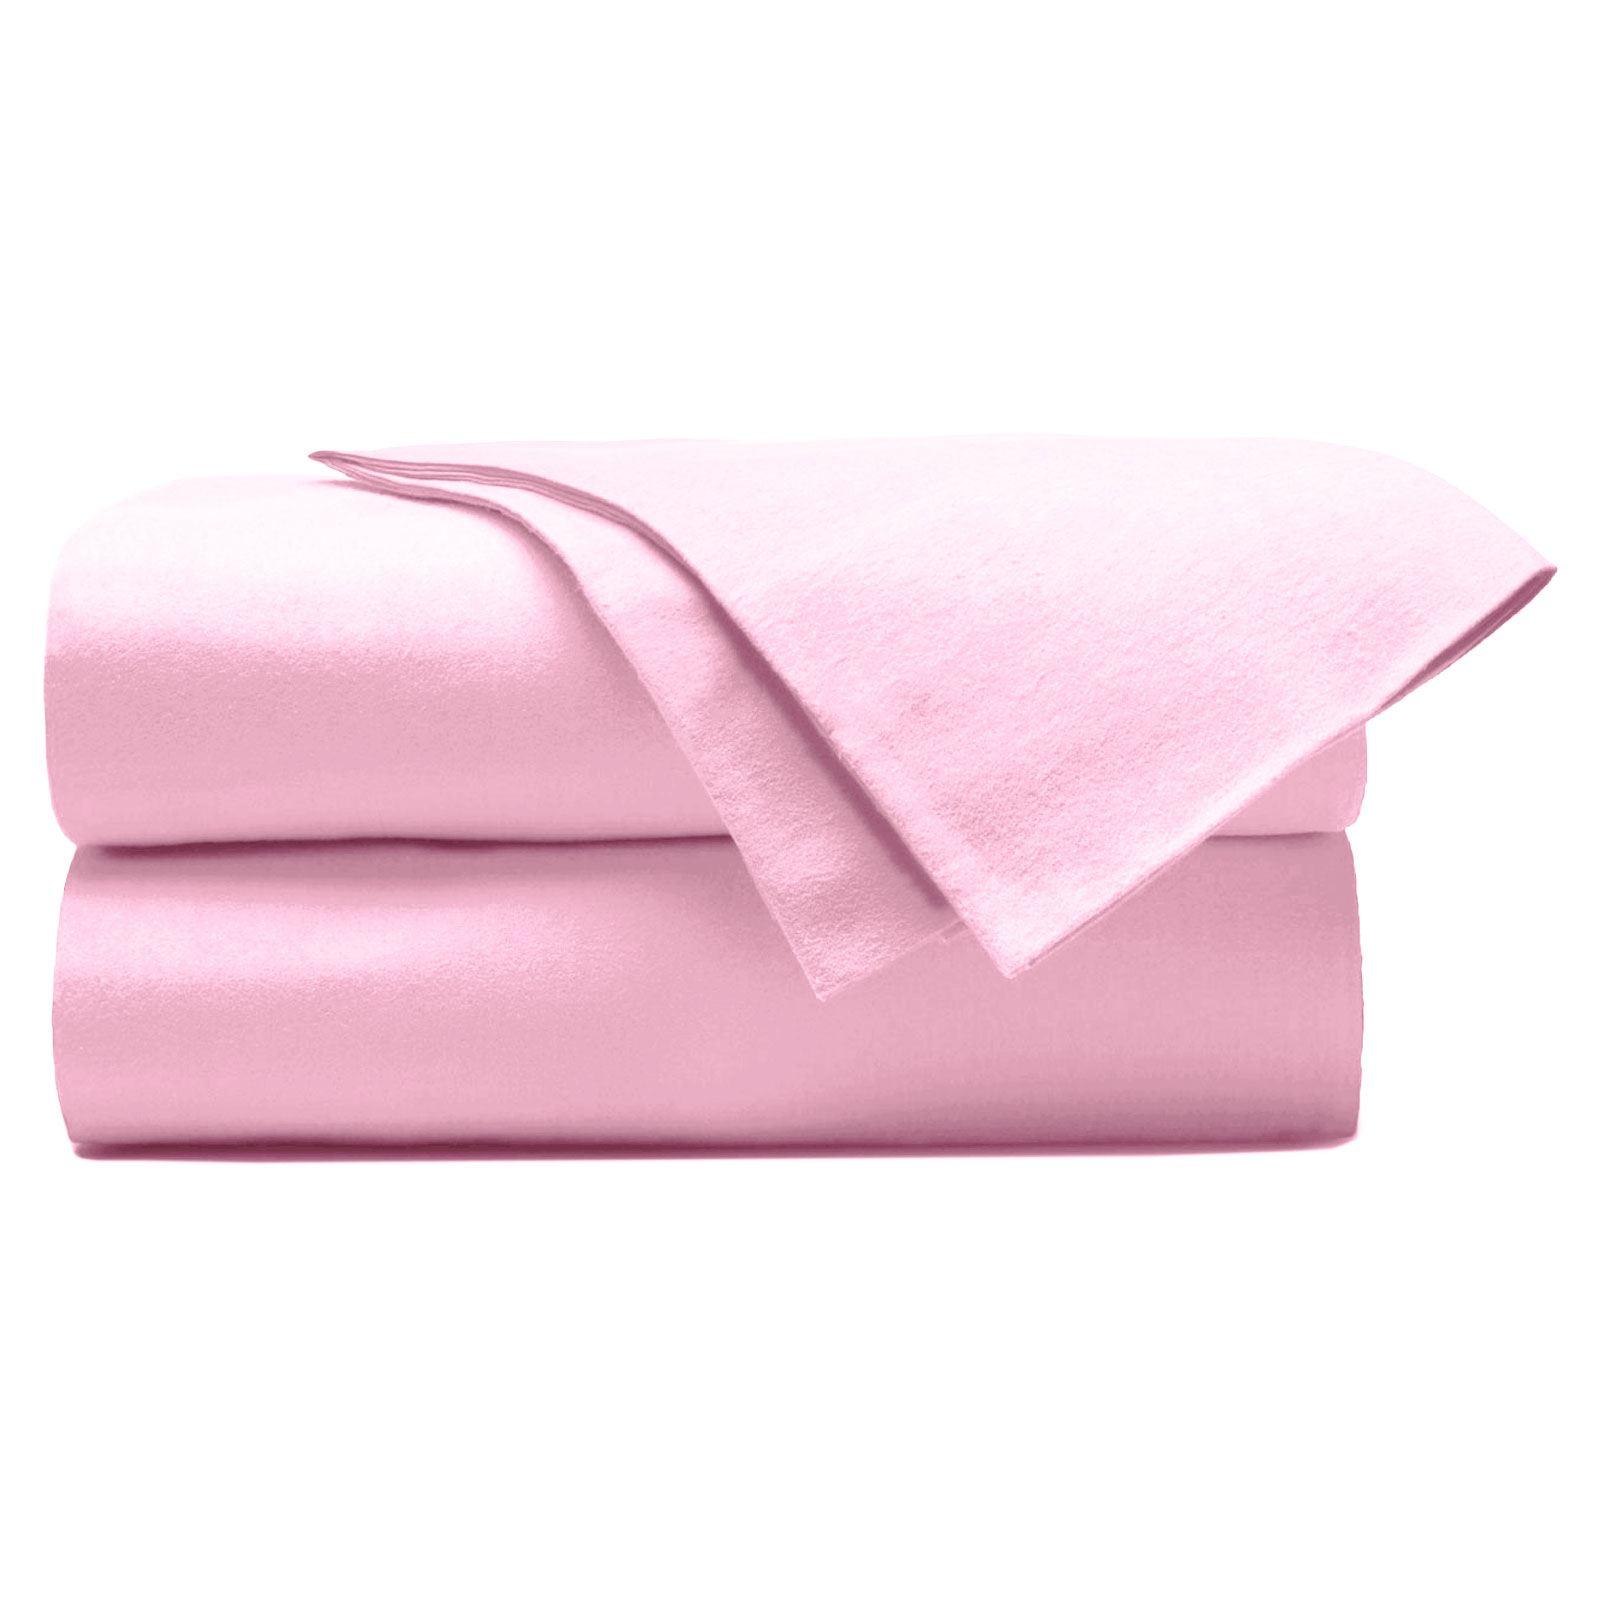 fitted bed sheets flannelette 100 brushed cotton dyed. Black Bedroom Furniture Sets. Home Design Ideas